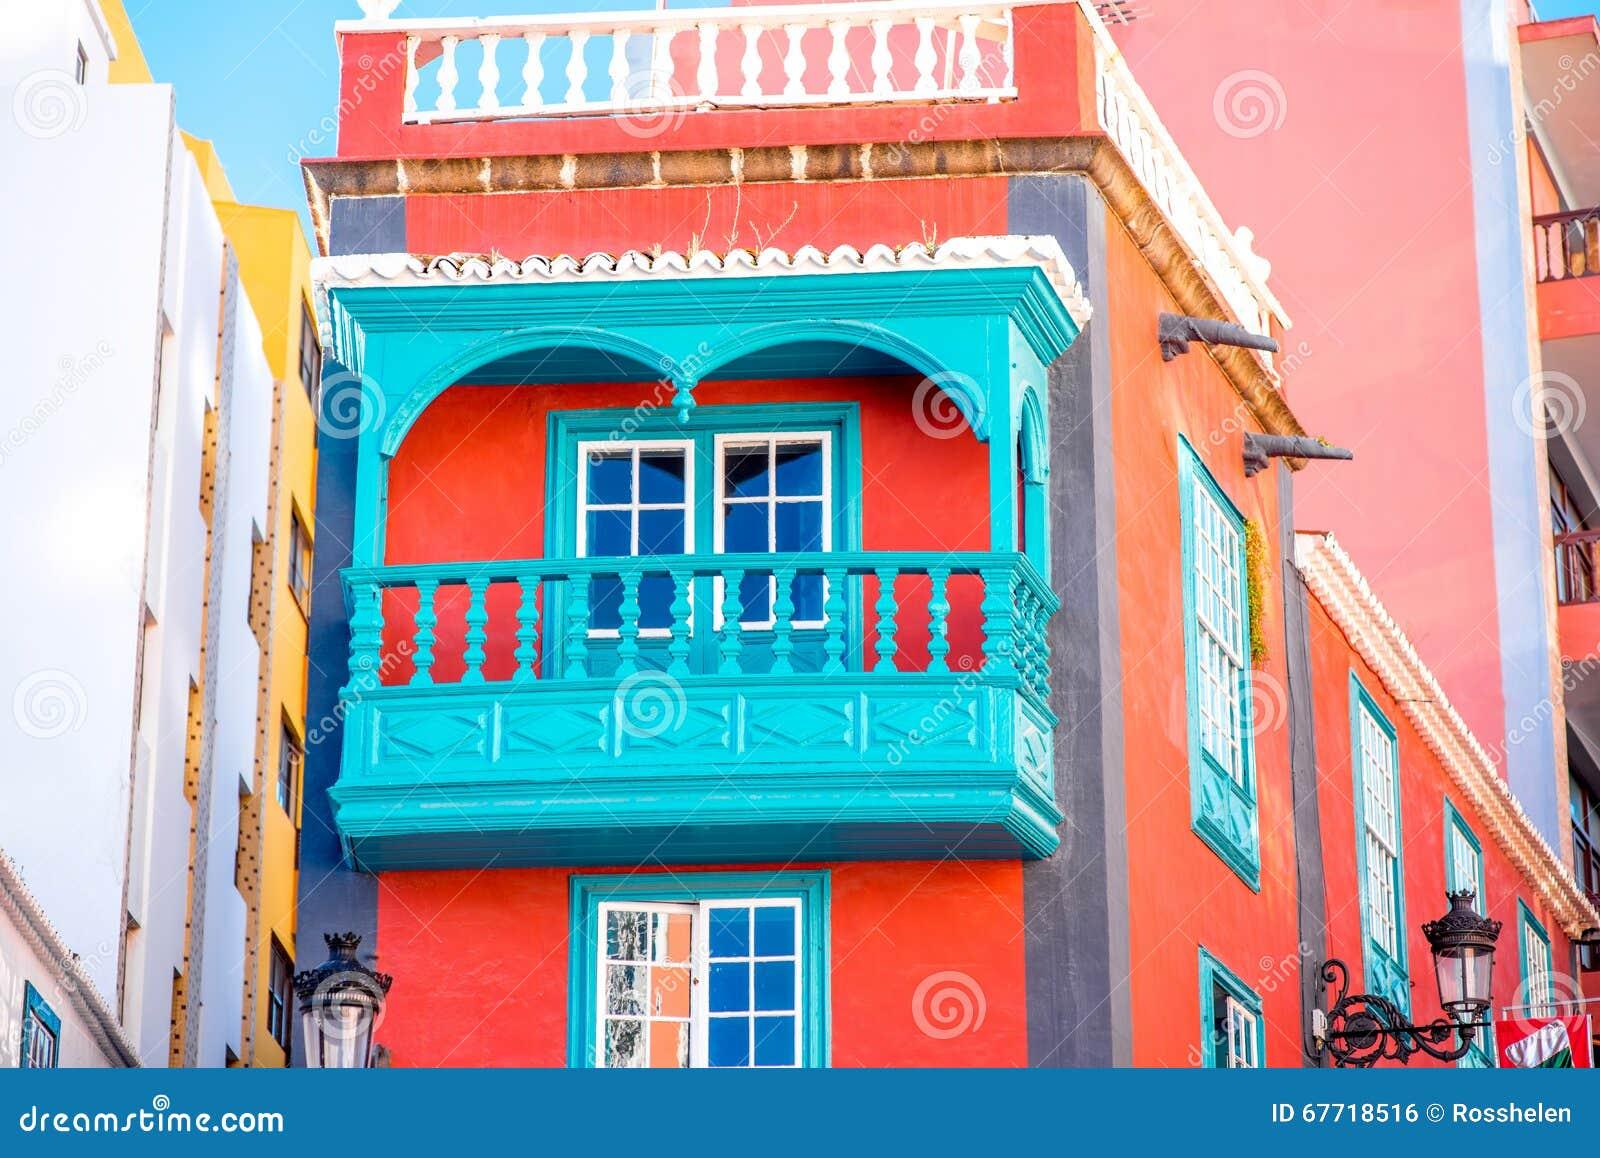 colorful house with beautiful balcony in santa cruz de la palma old town on la palma island in spain